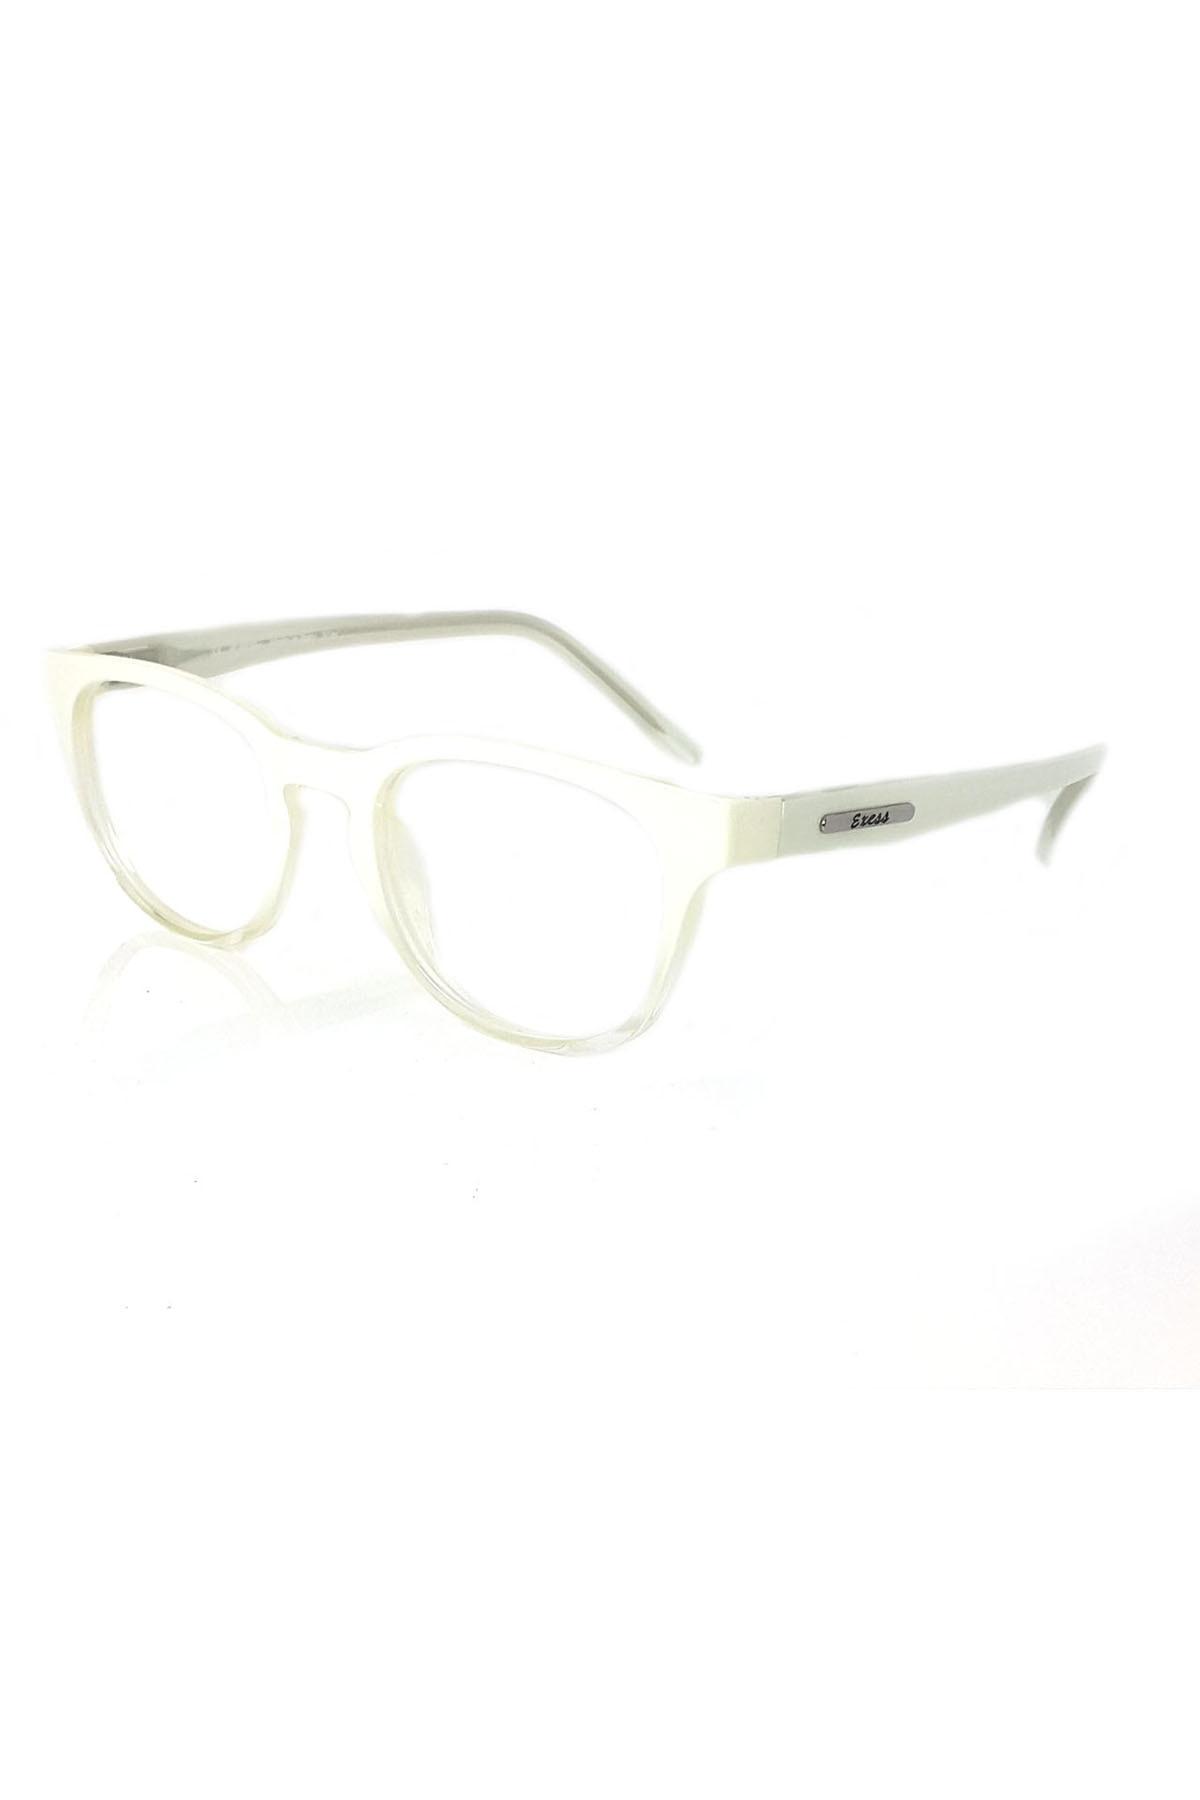 Markamilla Women Reading Glasses Frame Demo Glasses Eyewear Transparent High Quality WomenExess E 210 7870 49